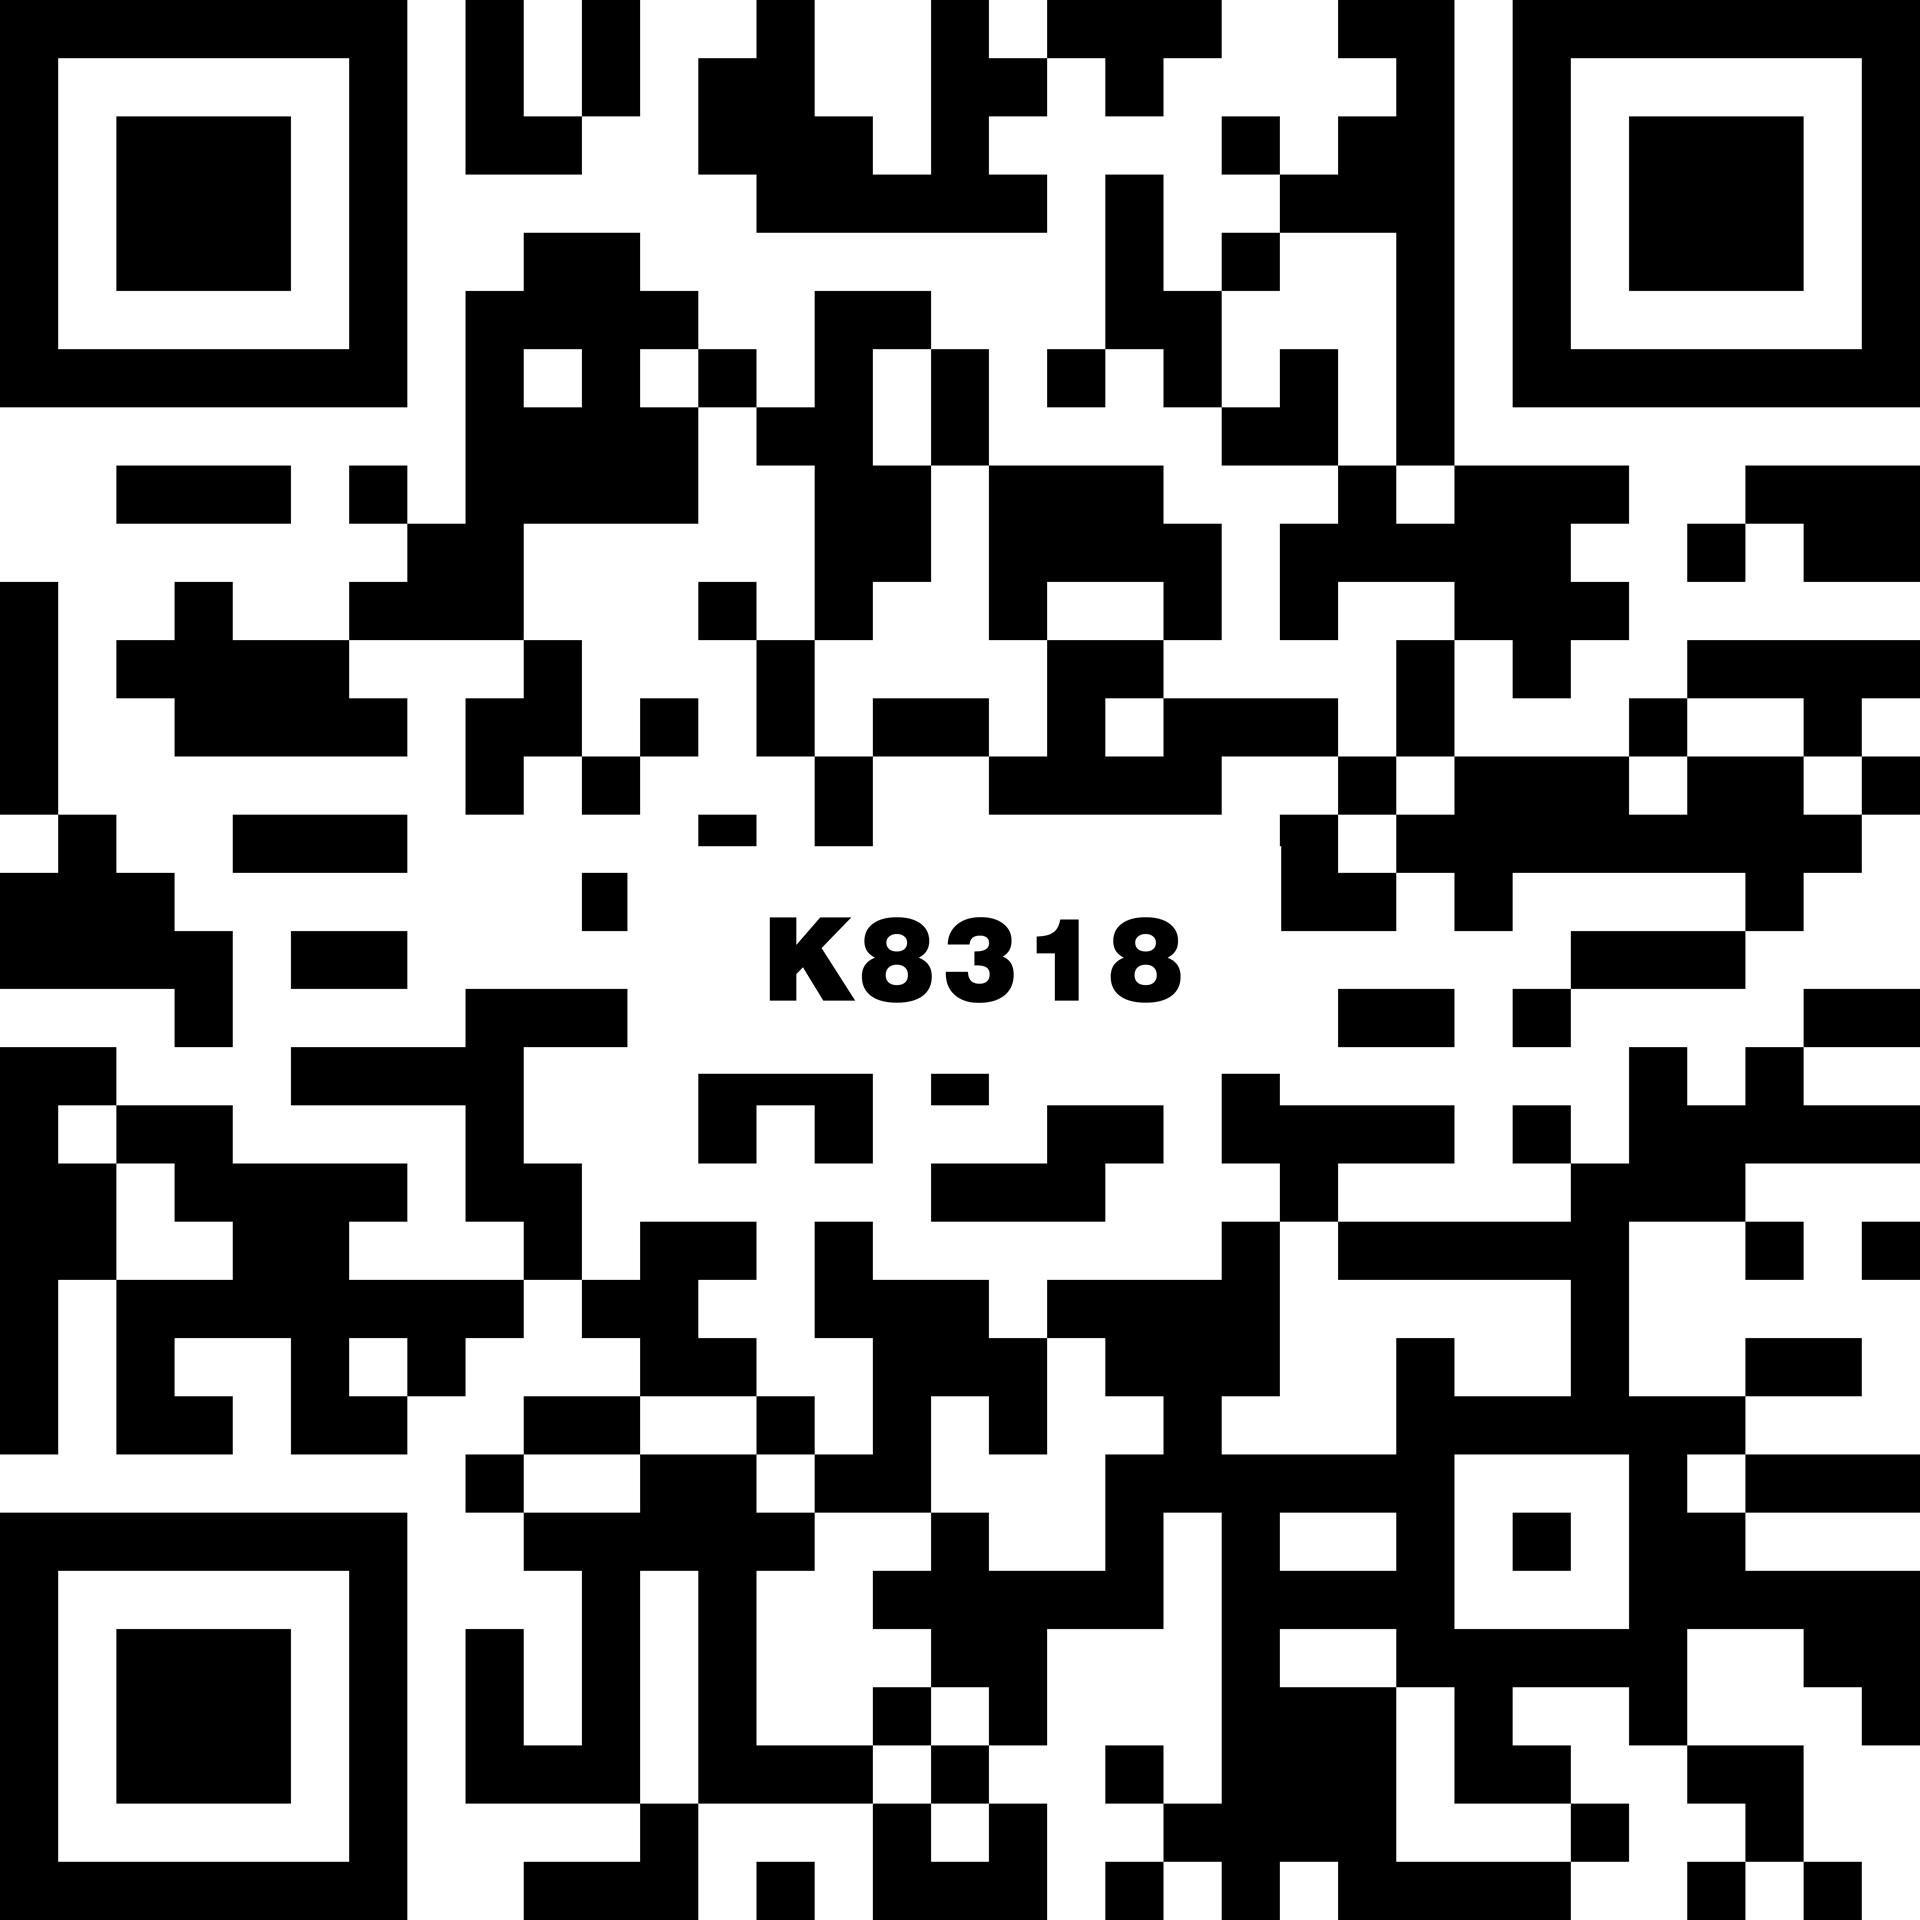 K8318